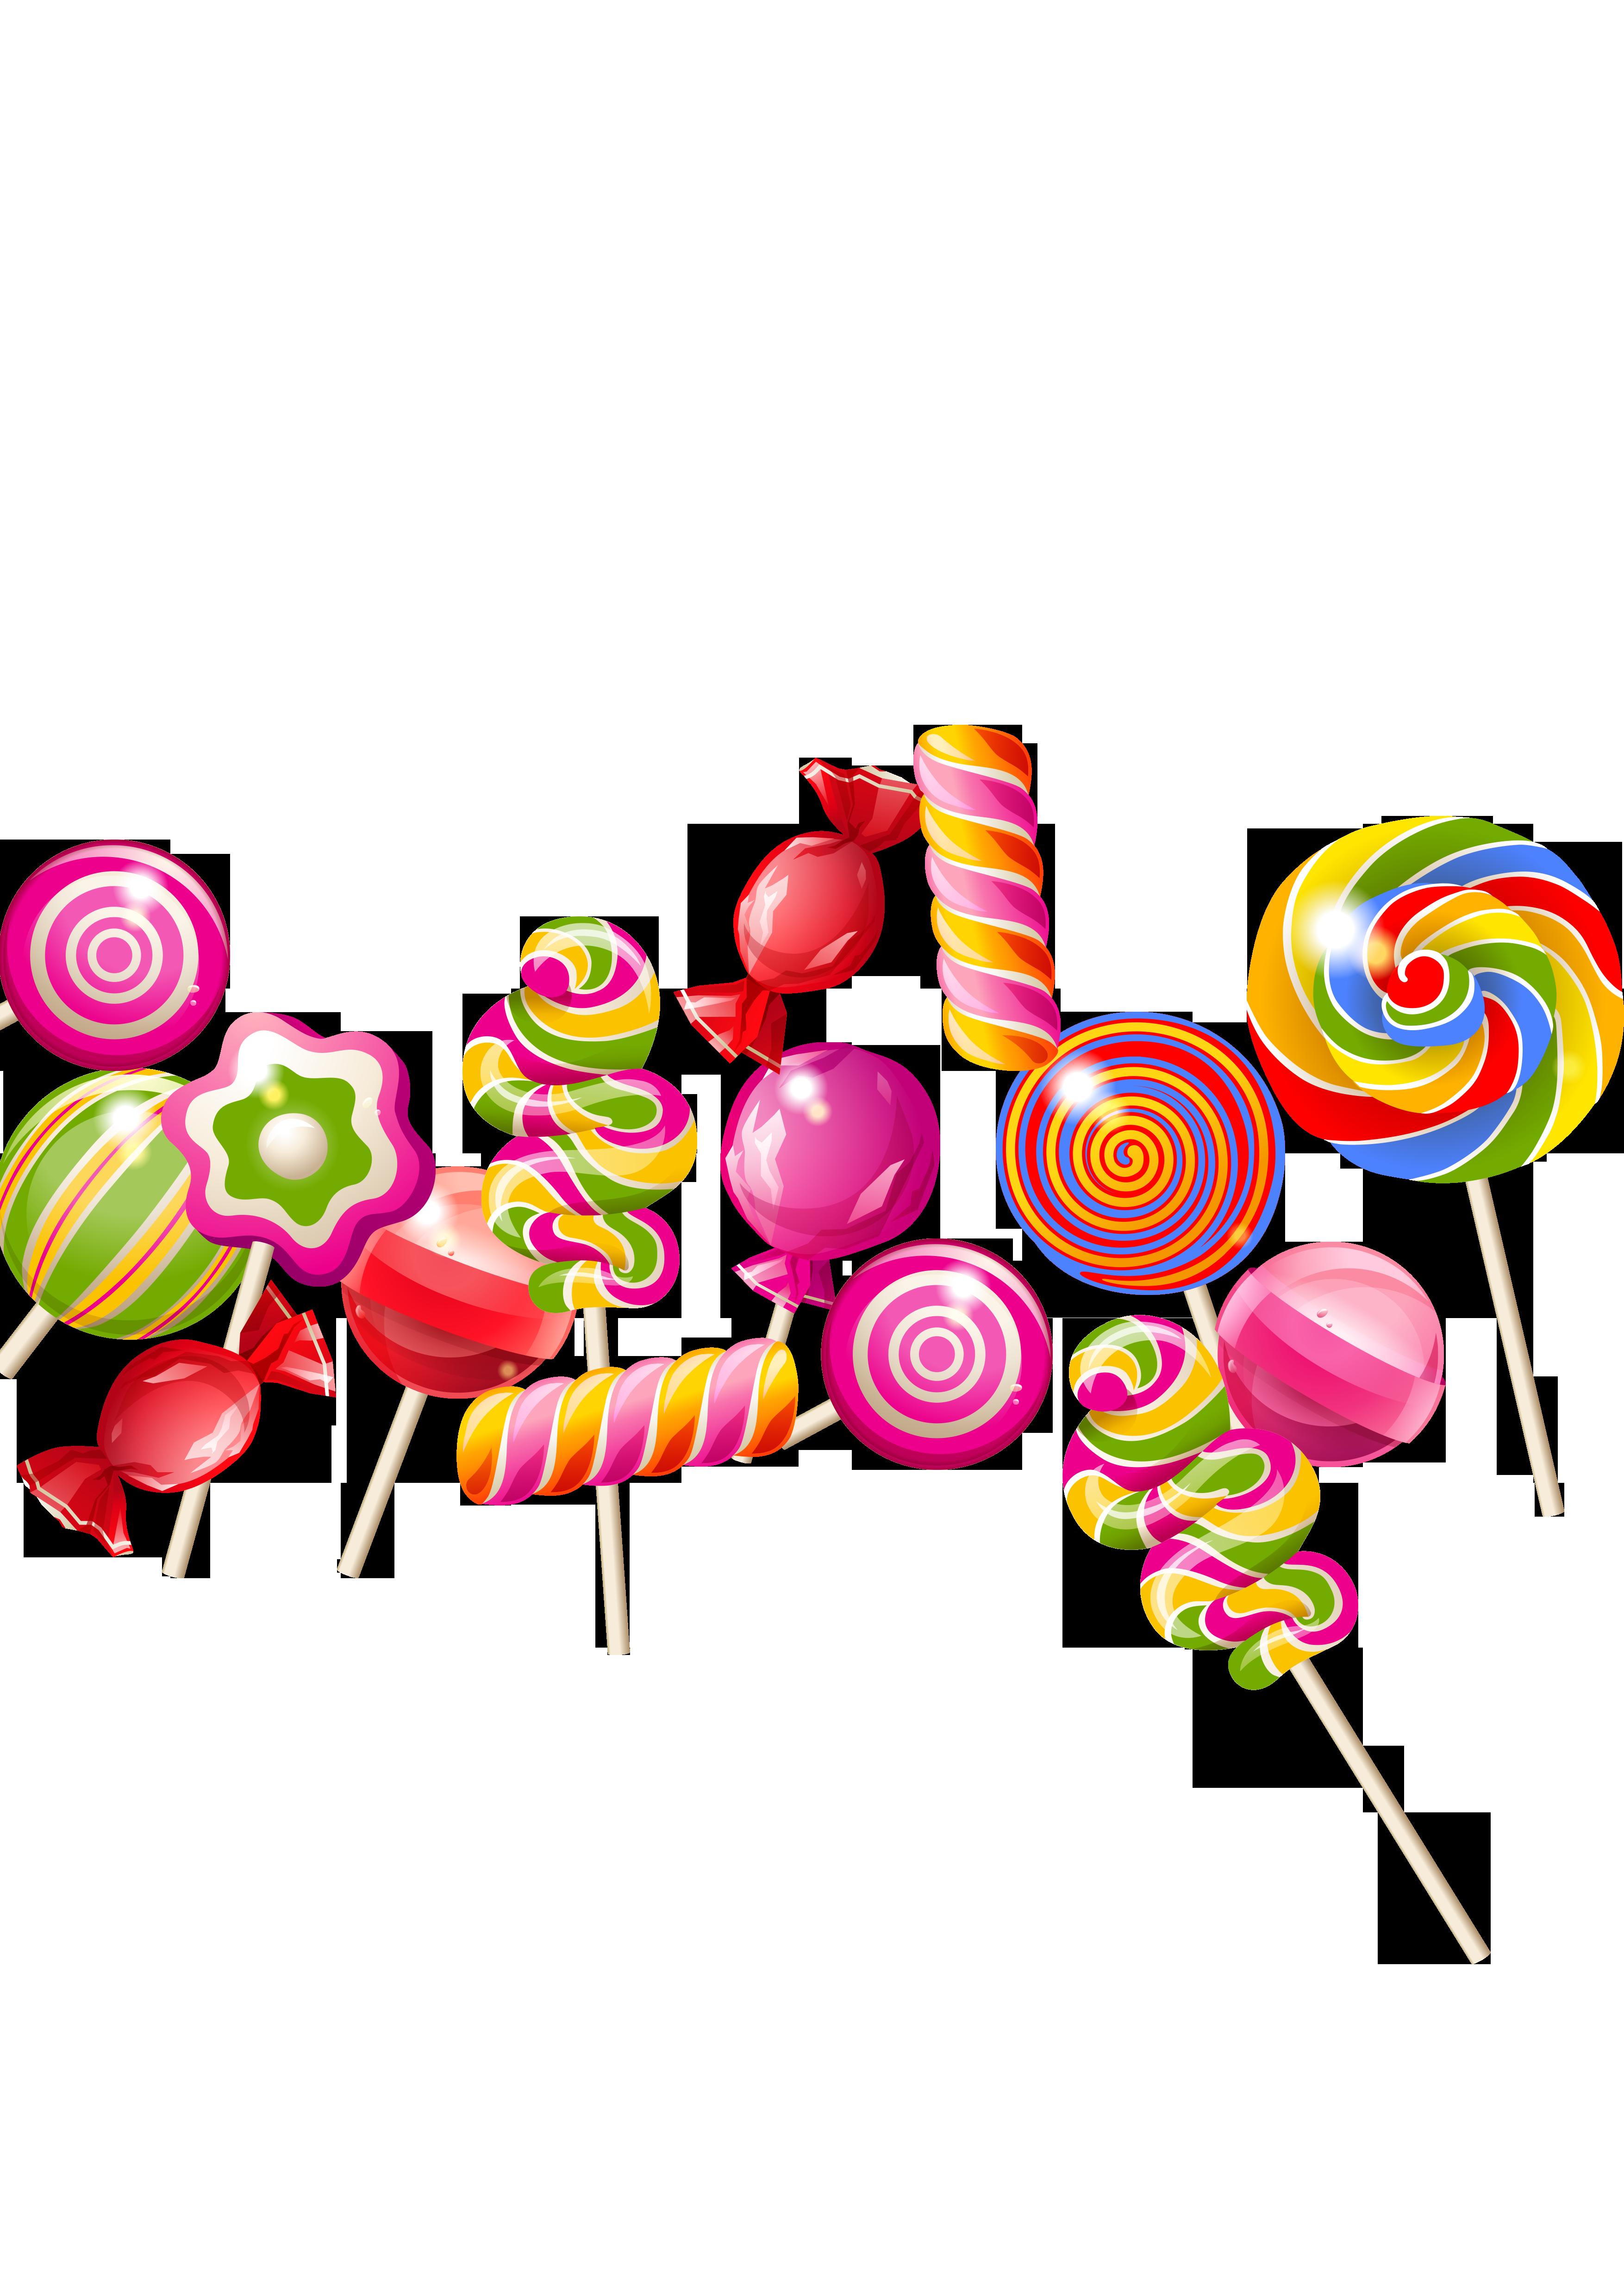 Lollipop clipart watercolor. Candy cane taffy transprent